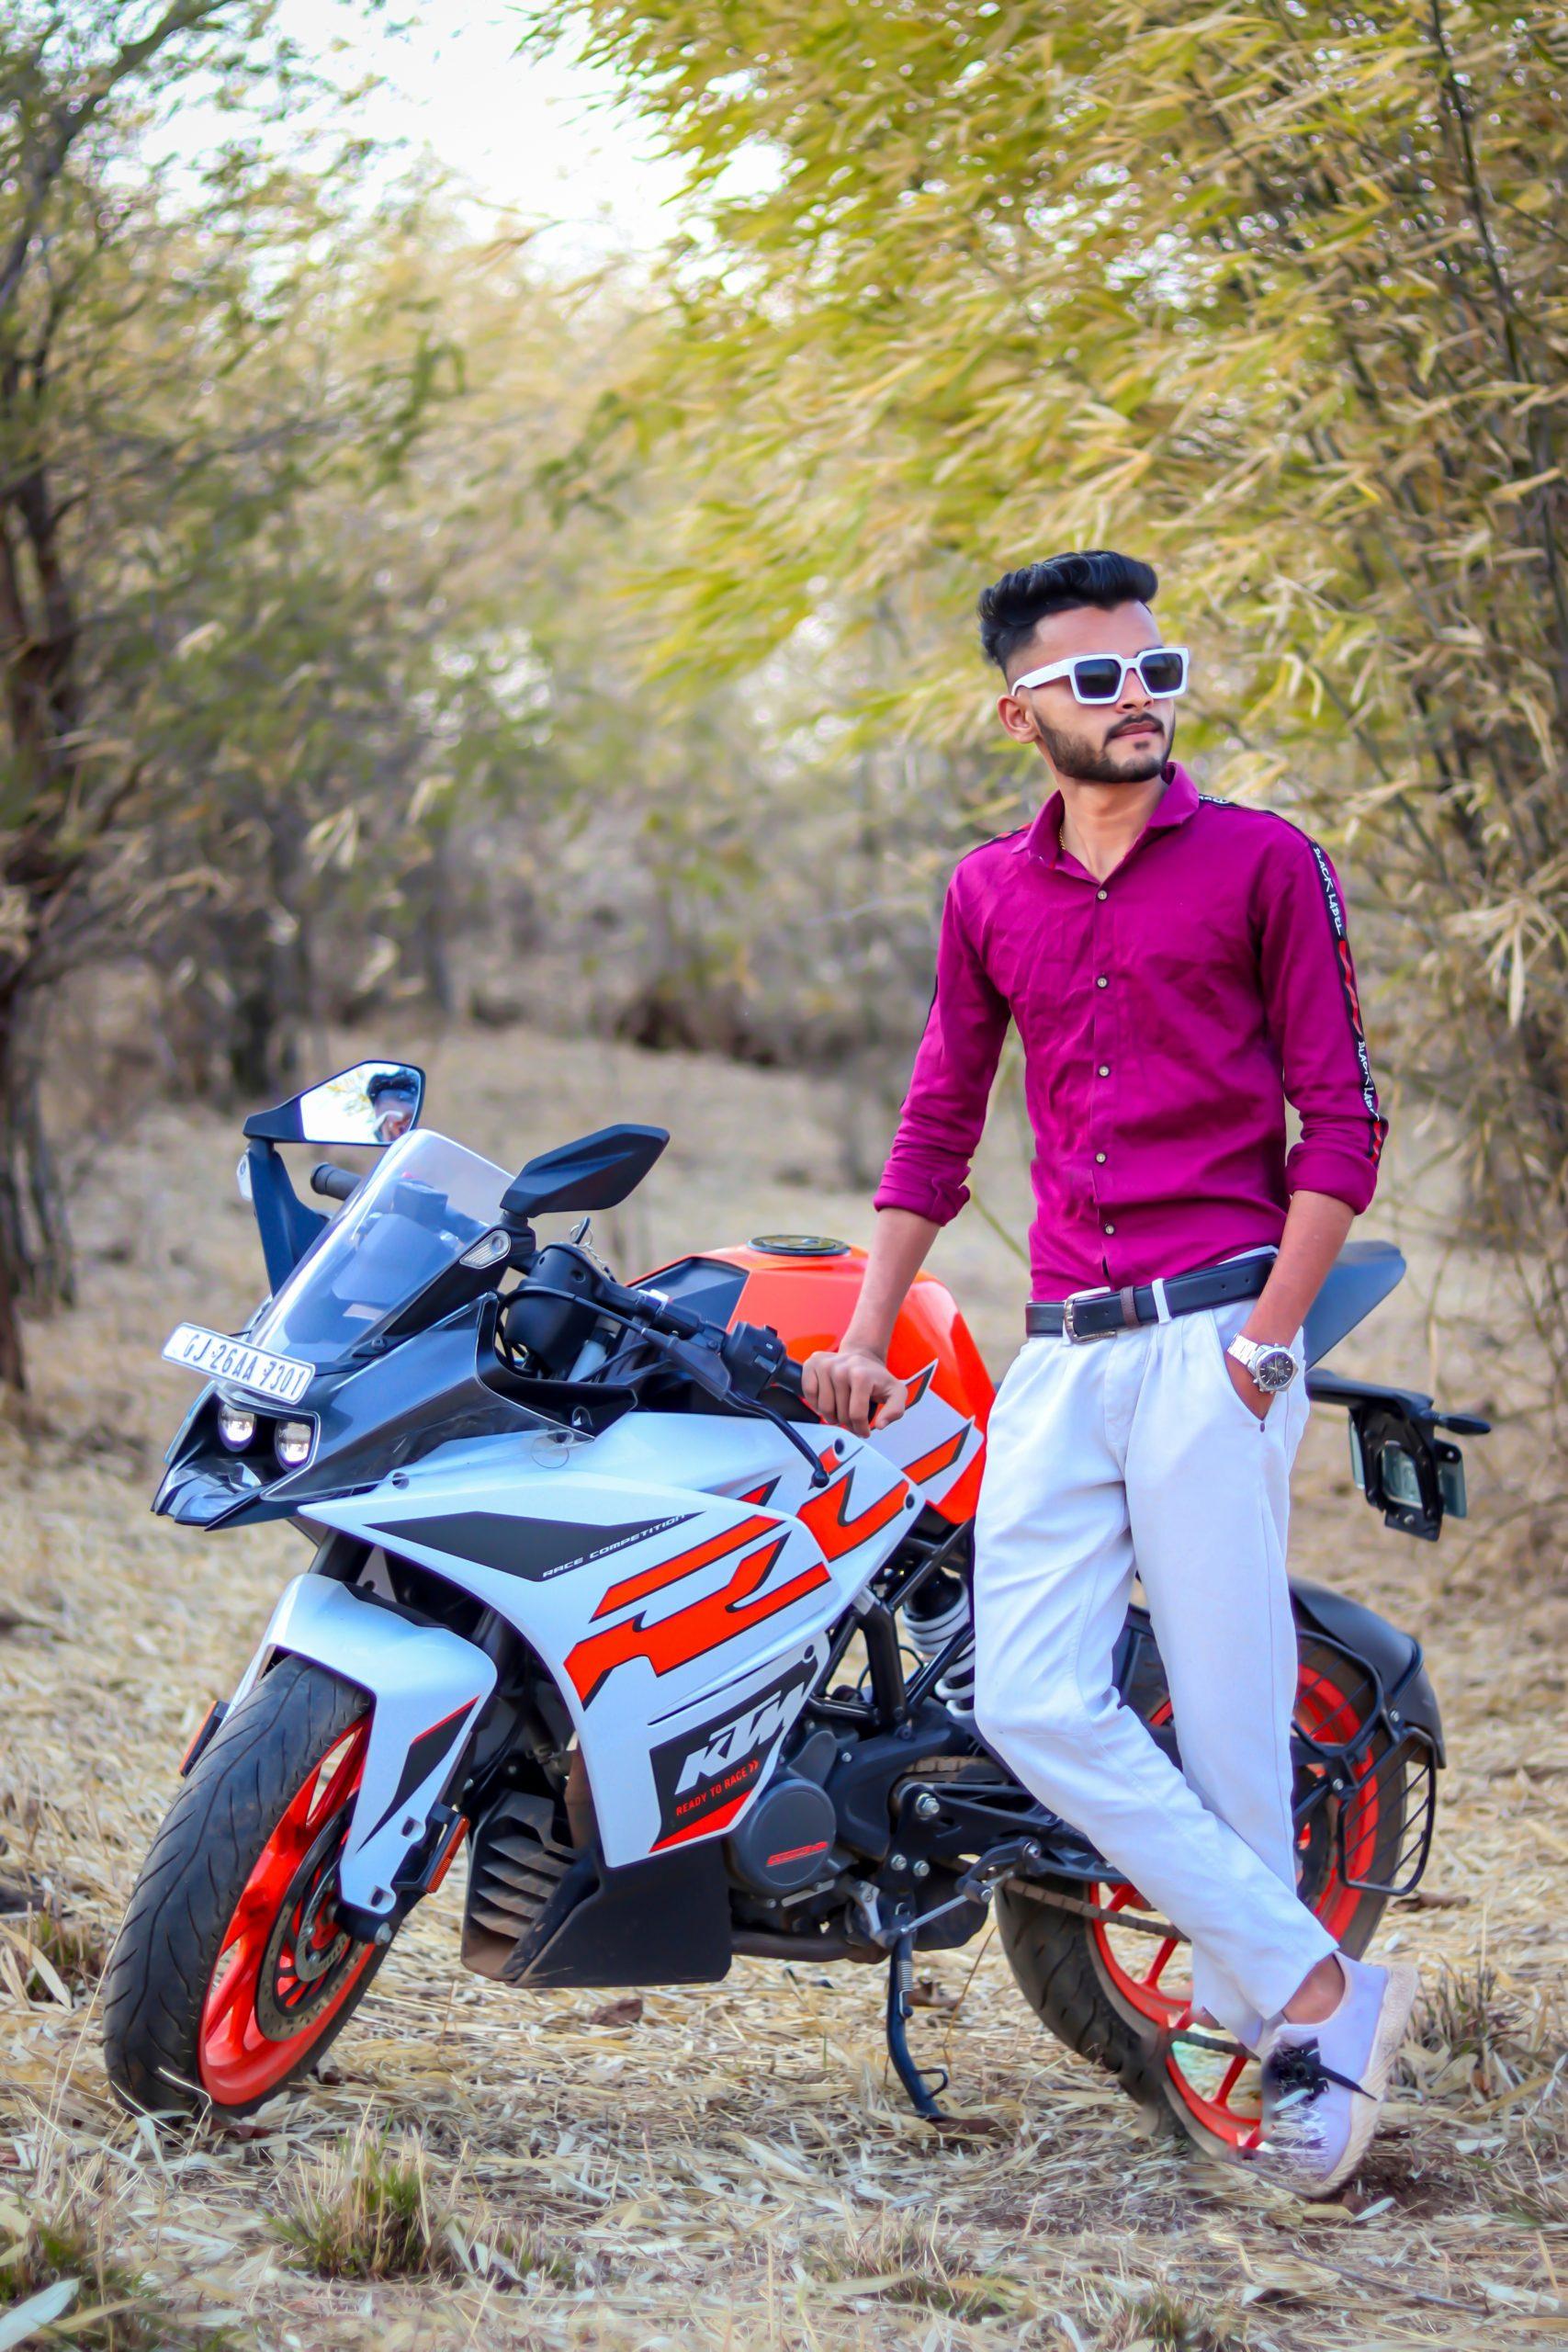 Boy posing near KTM bike